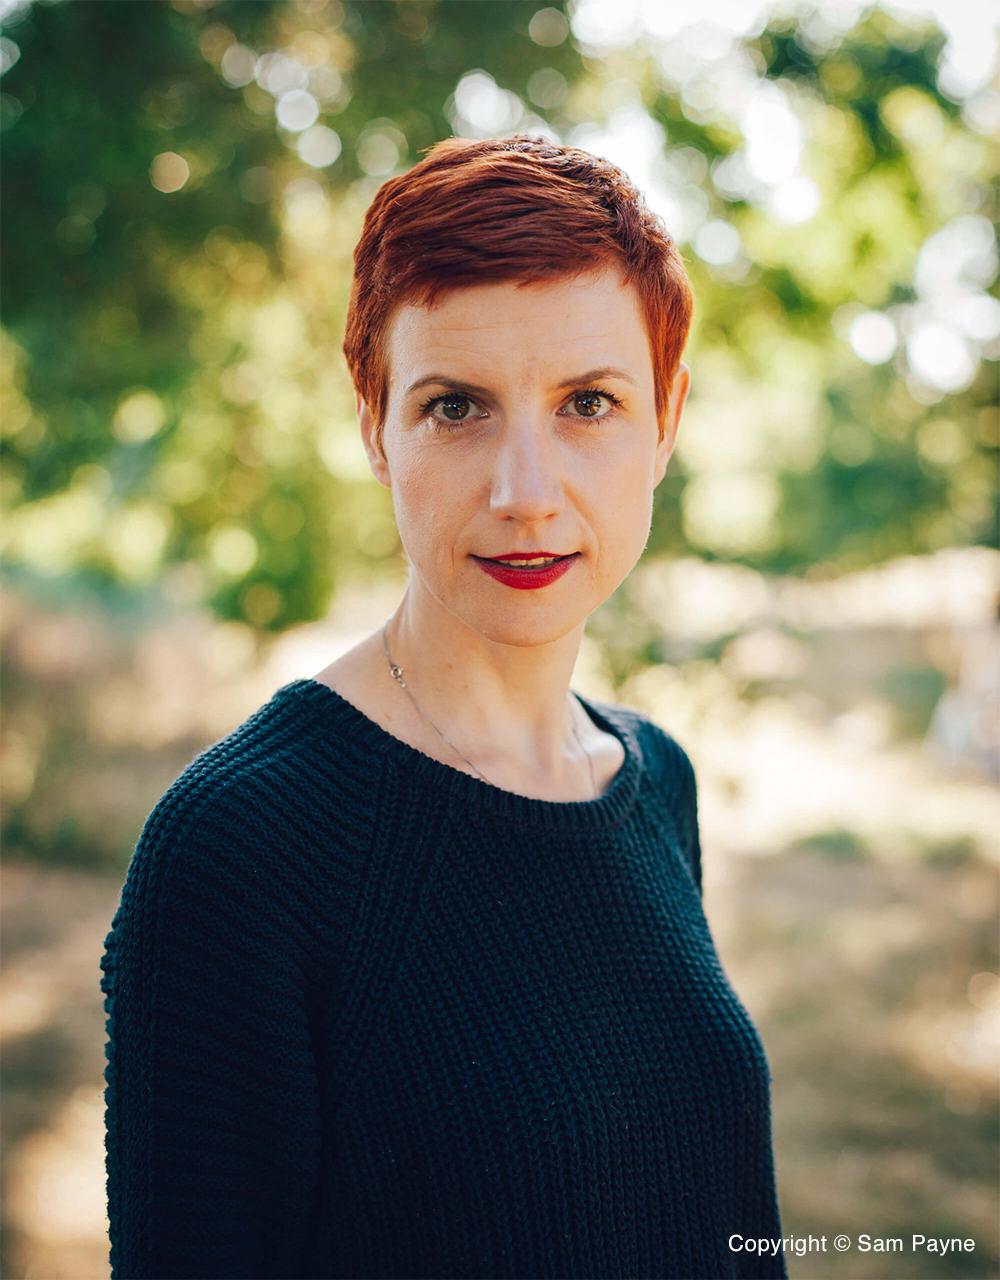 sasha-djurkovich portrait.jpg